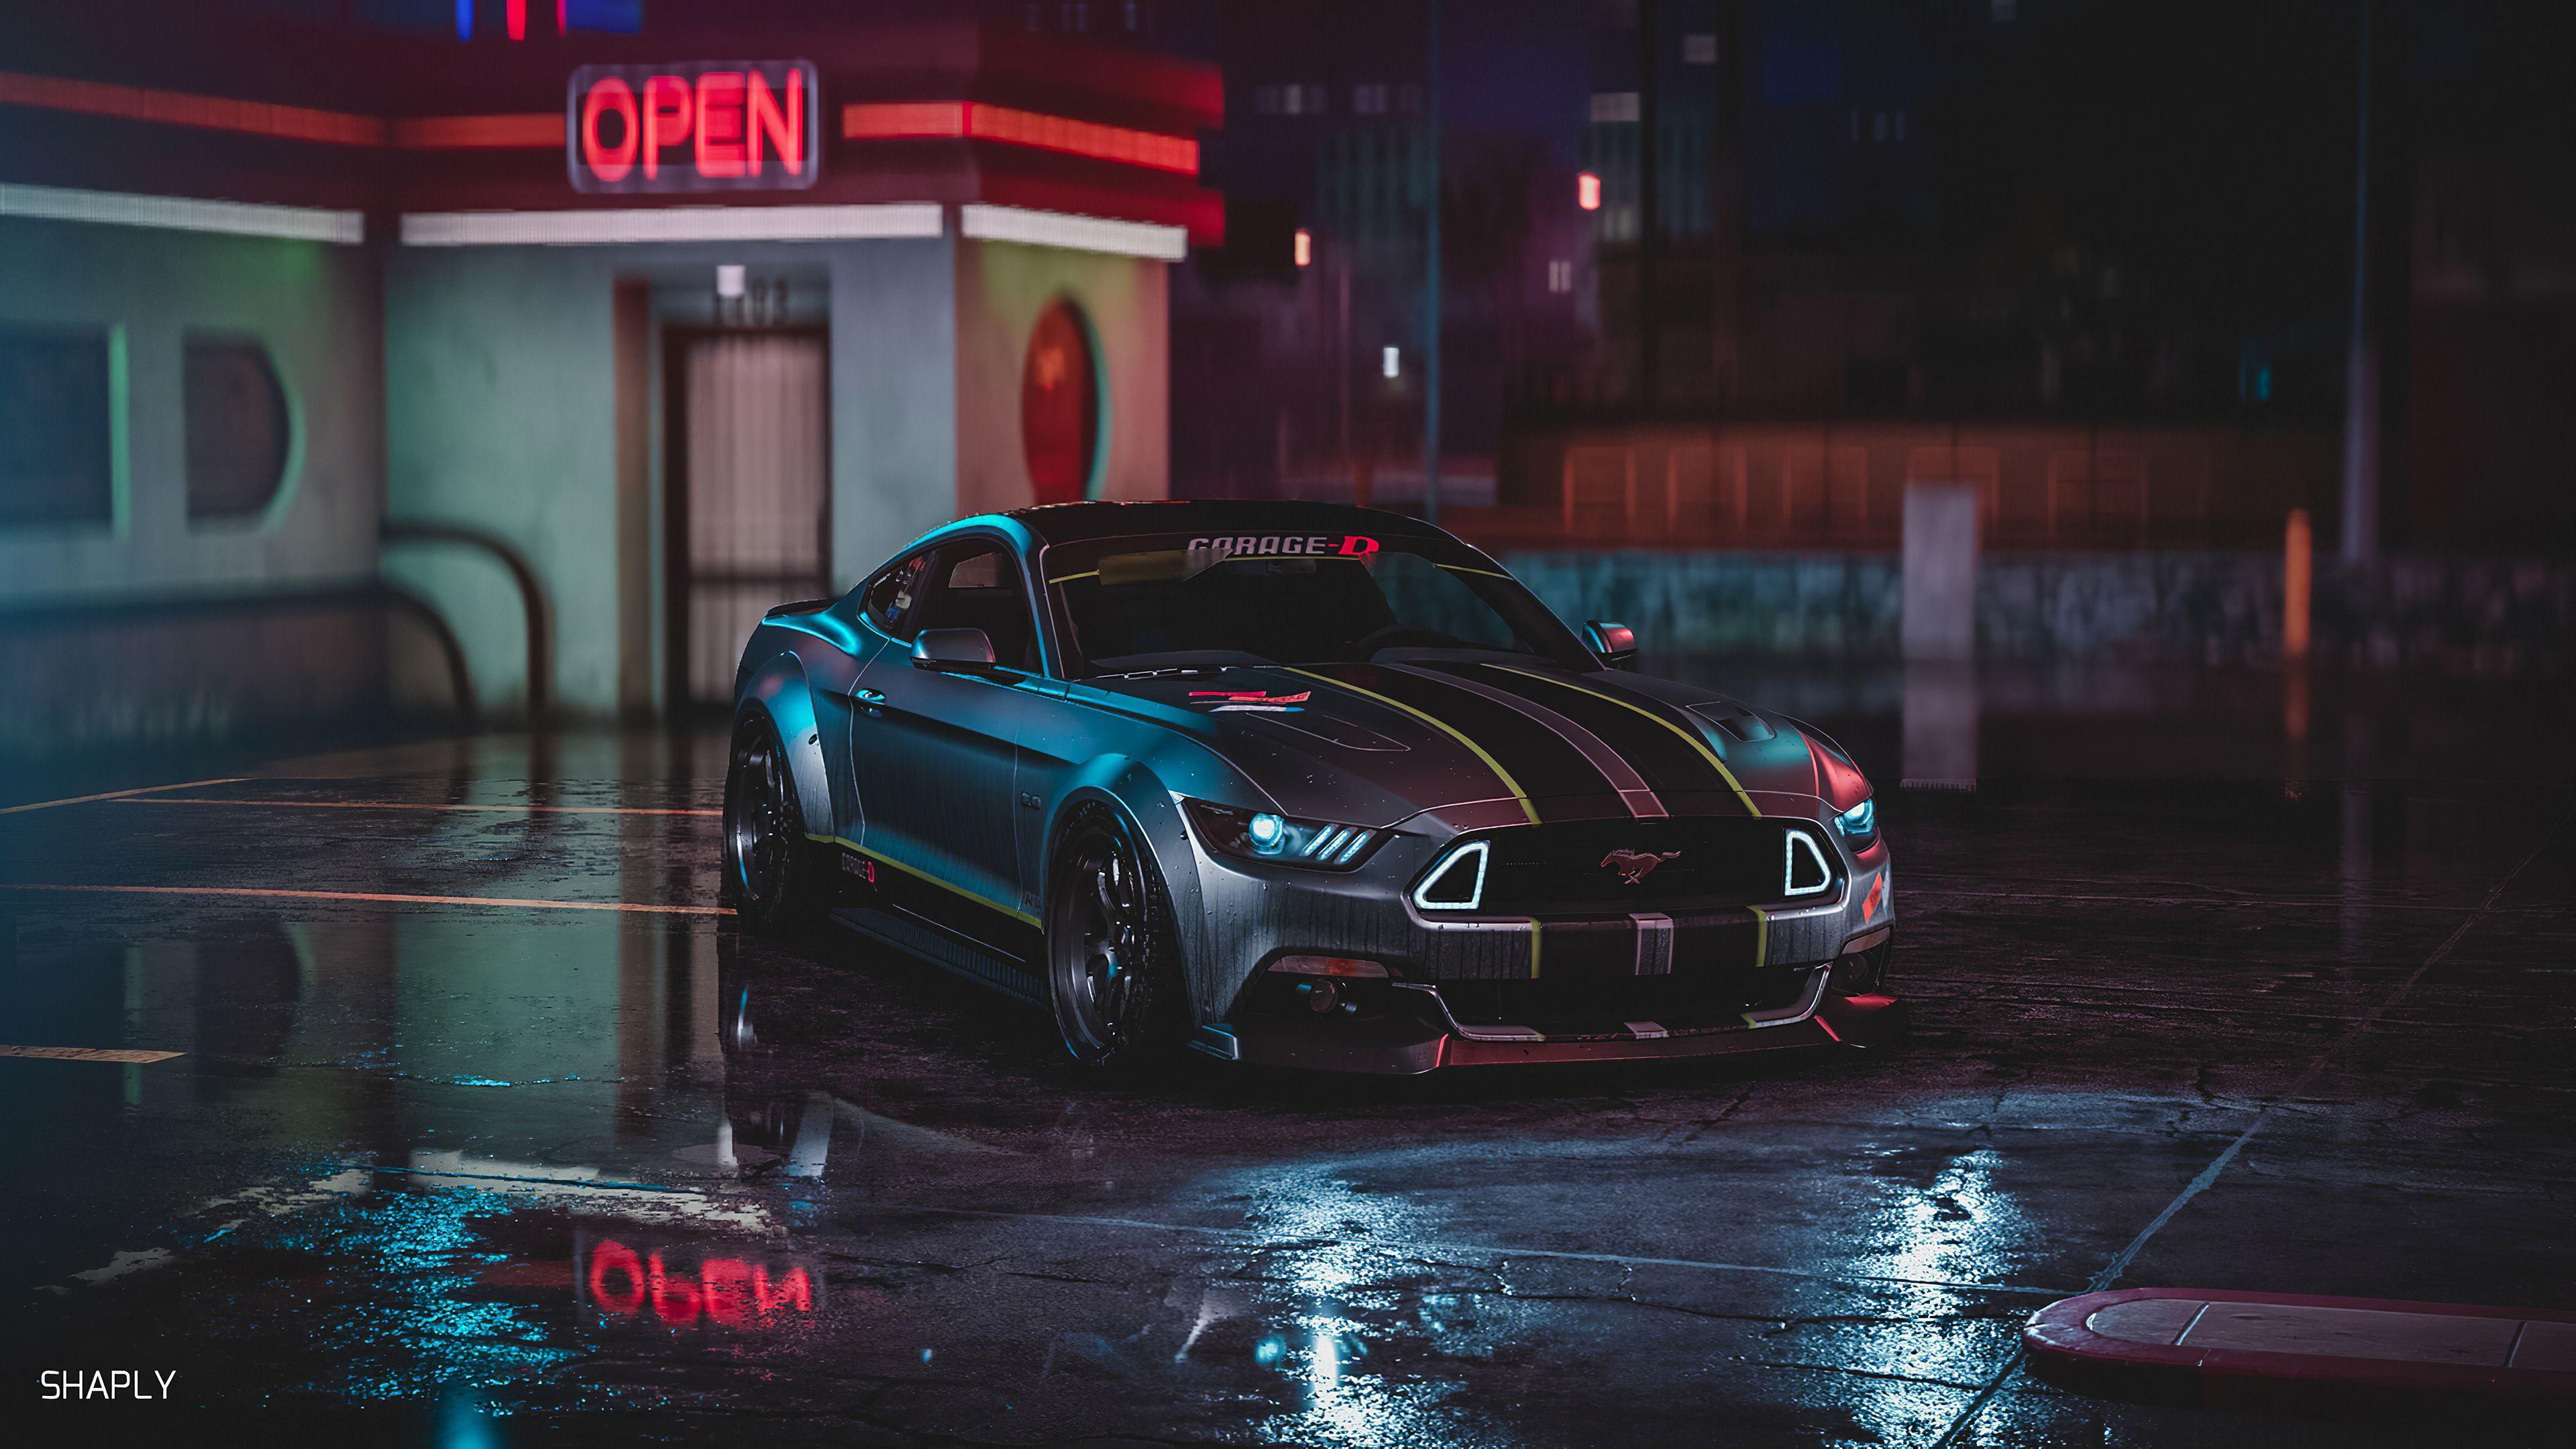 Mustang Gt Neon Ford Mustang Wallpaper Mustang Gt Ford Mustang